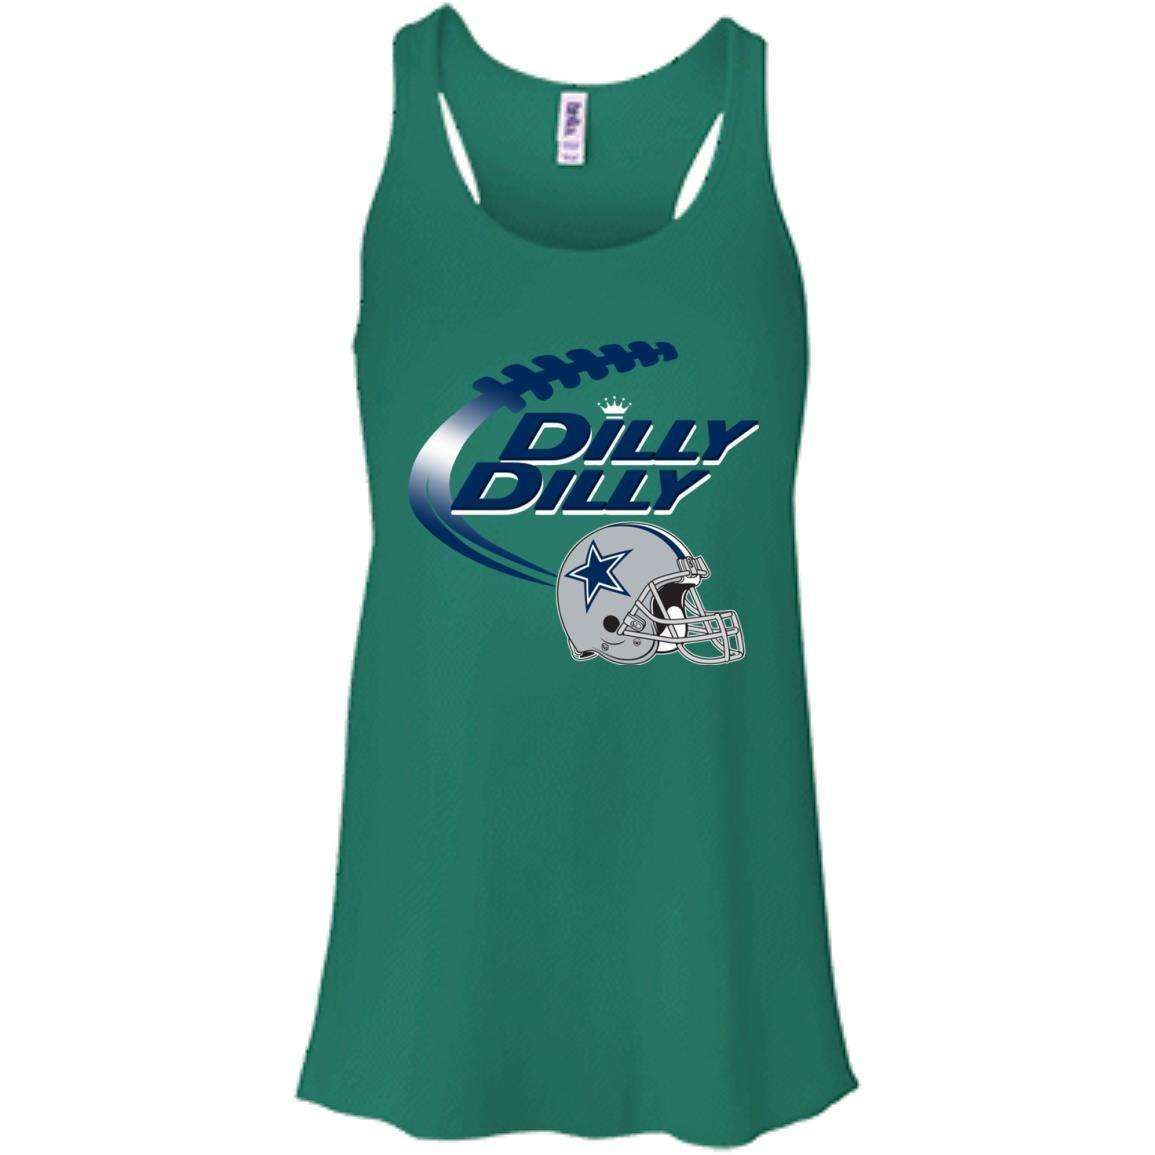 b10fad24 Bud Light Dilly Dilly Dallas Cowboys Helmet Logo T-shirt | Dallas ...